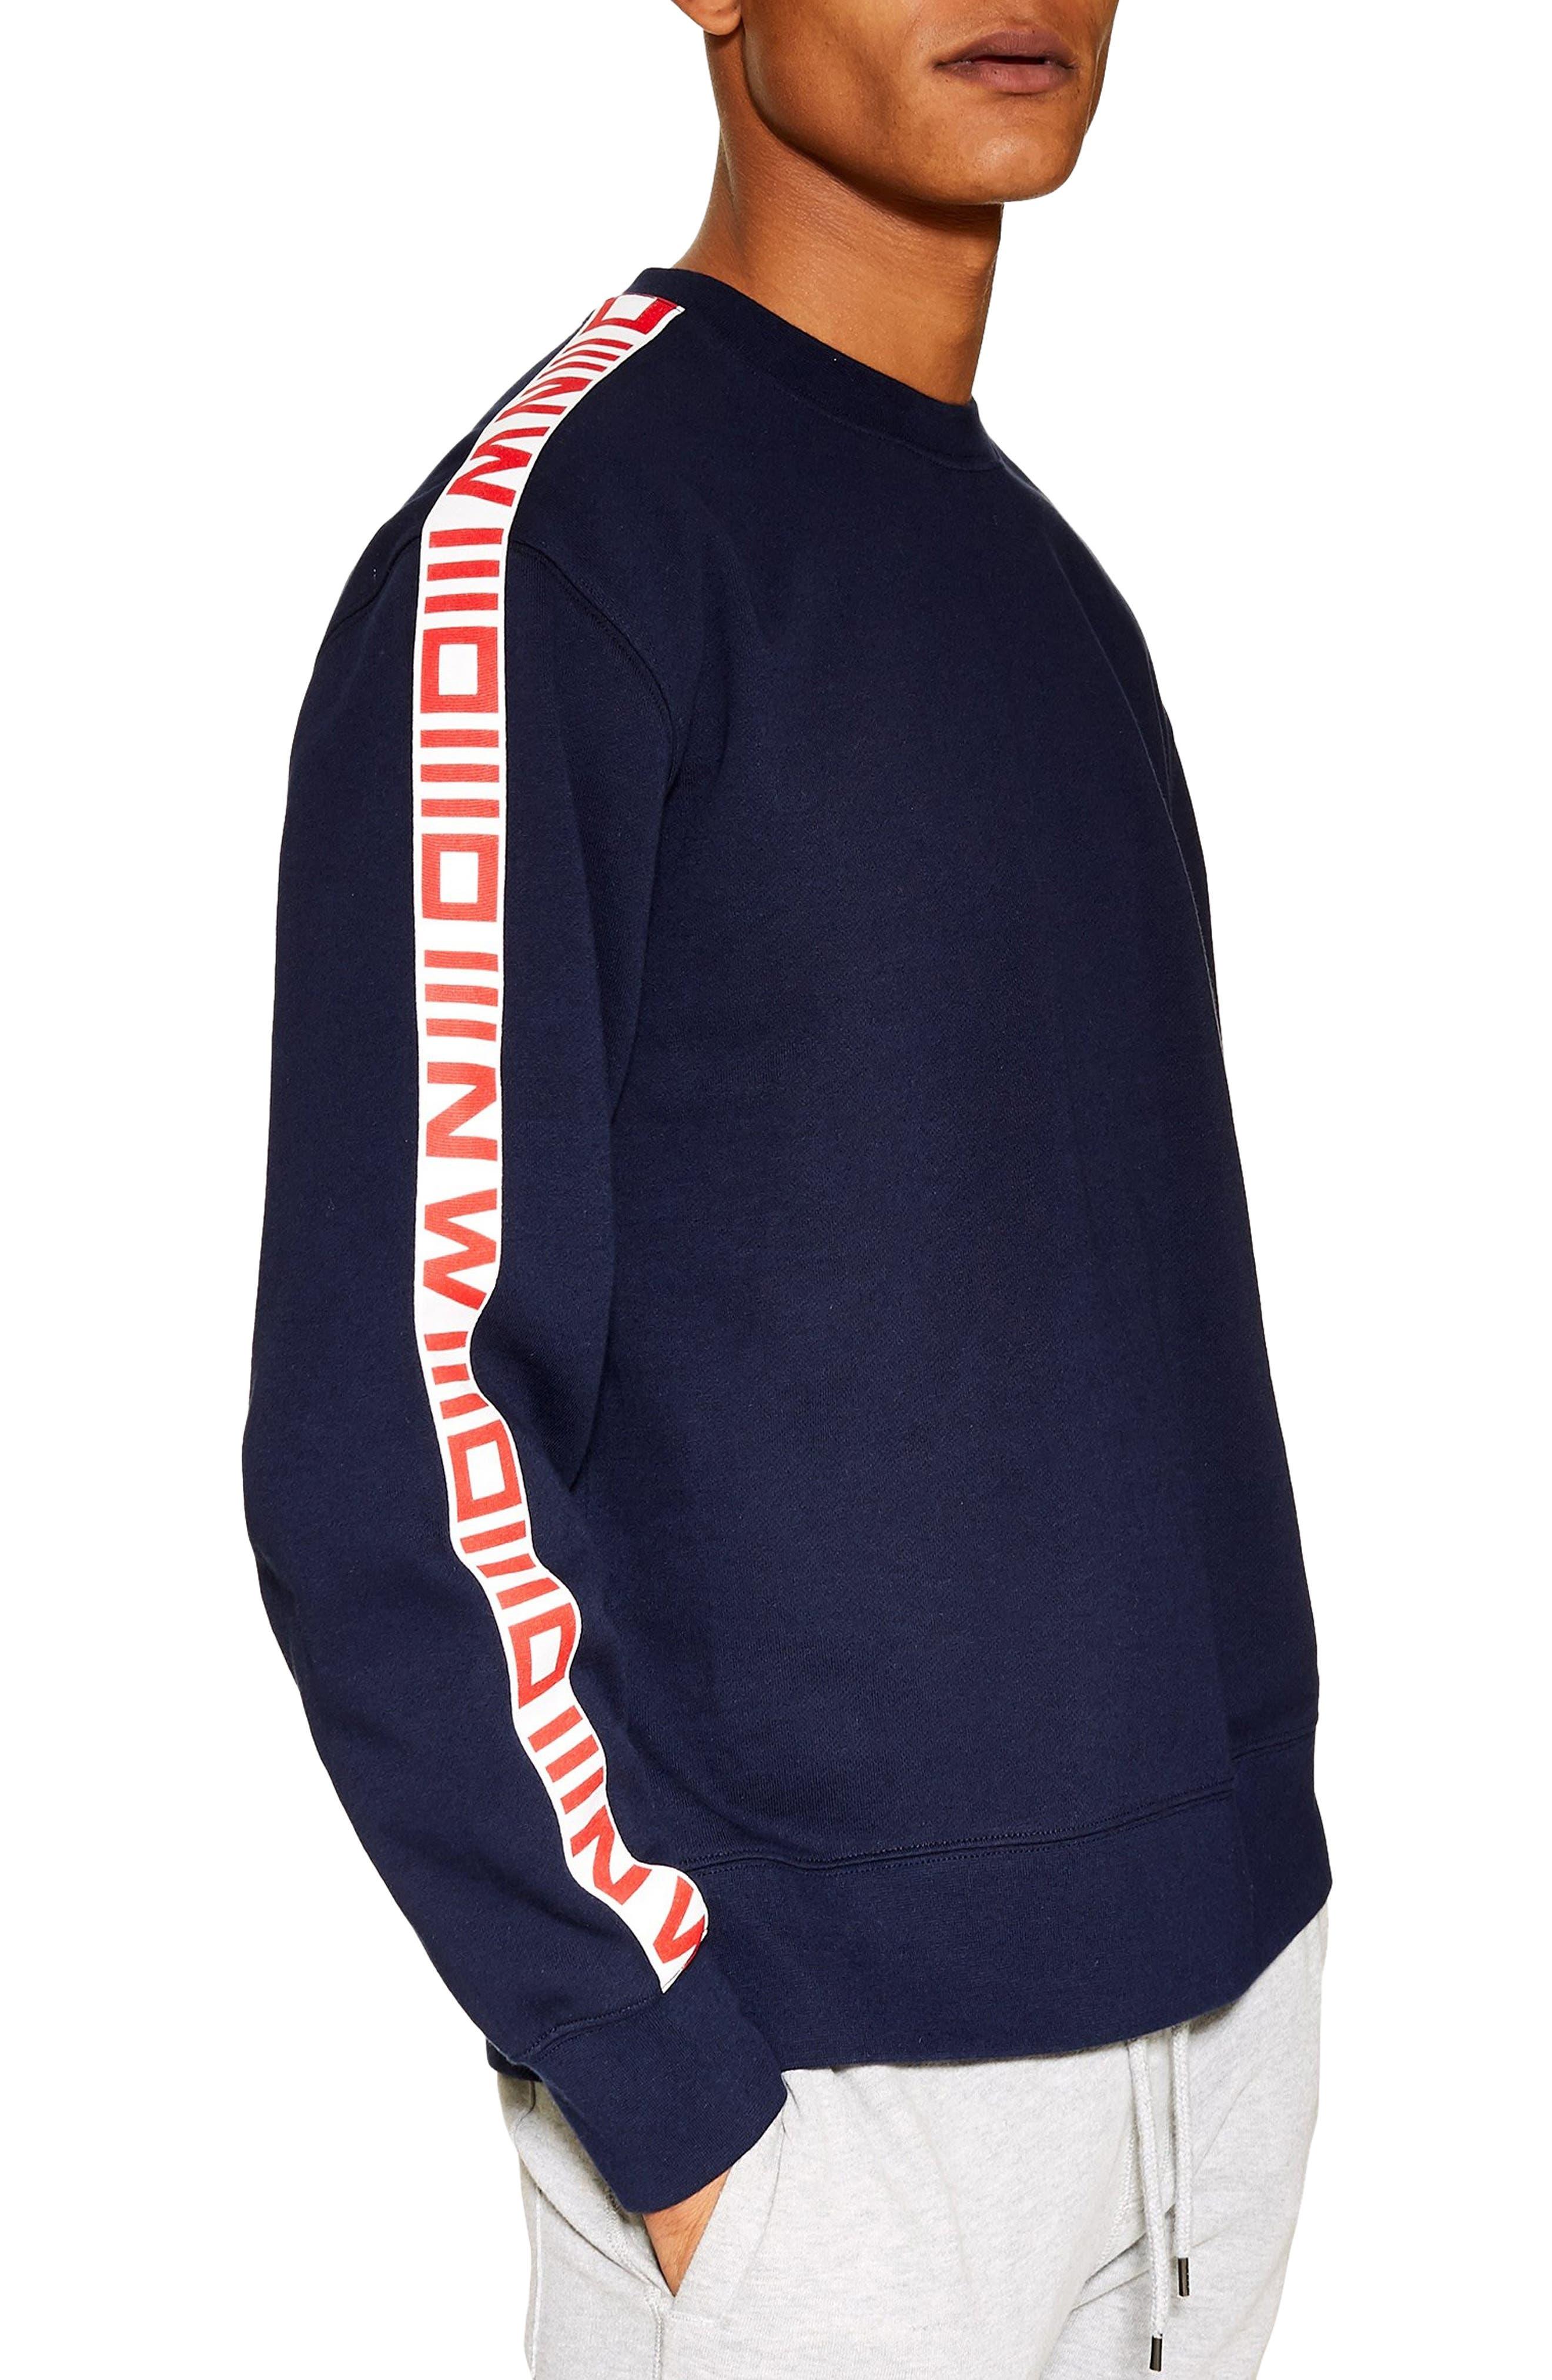 TOPMAN, Taped Crewneck Sweatshirt, Main thumbnail 1, color, NAVY MULTI